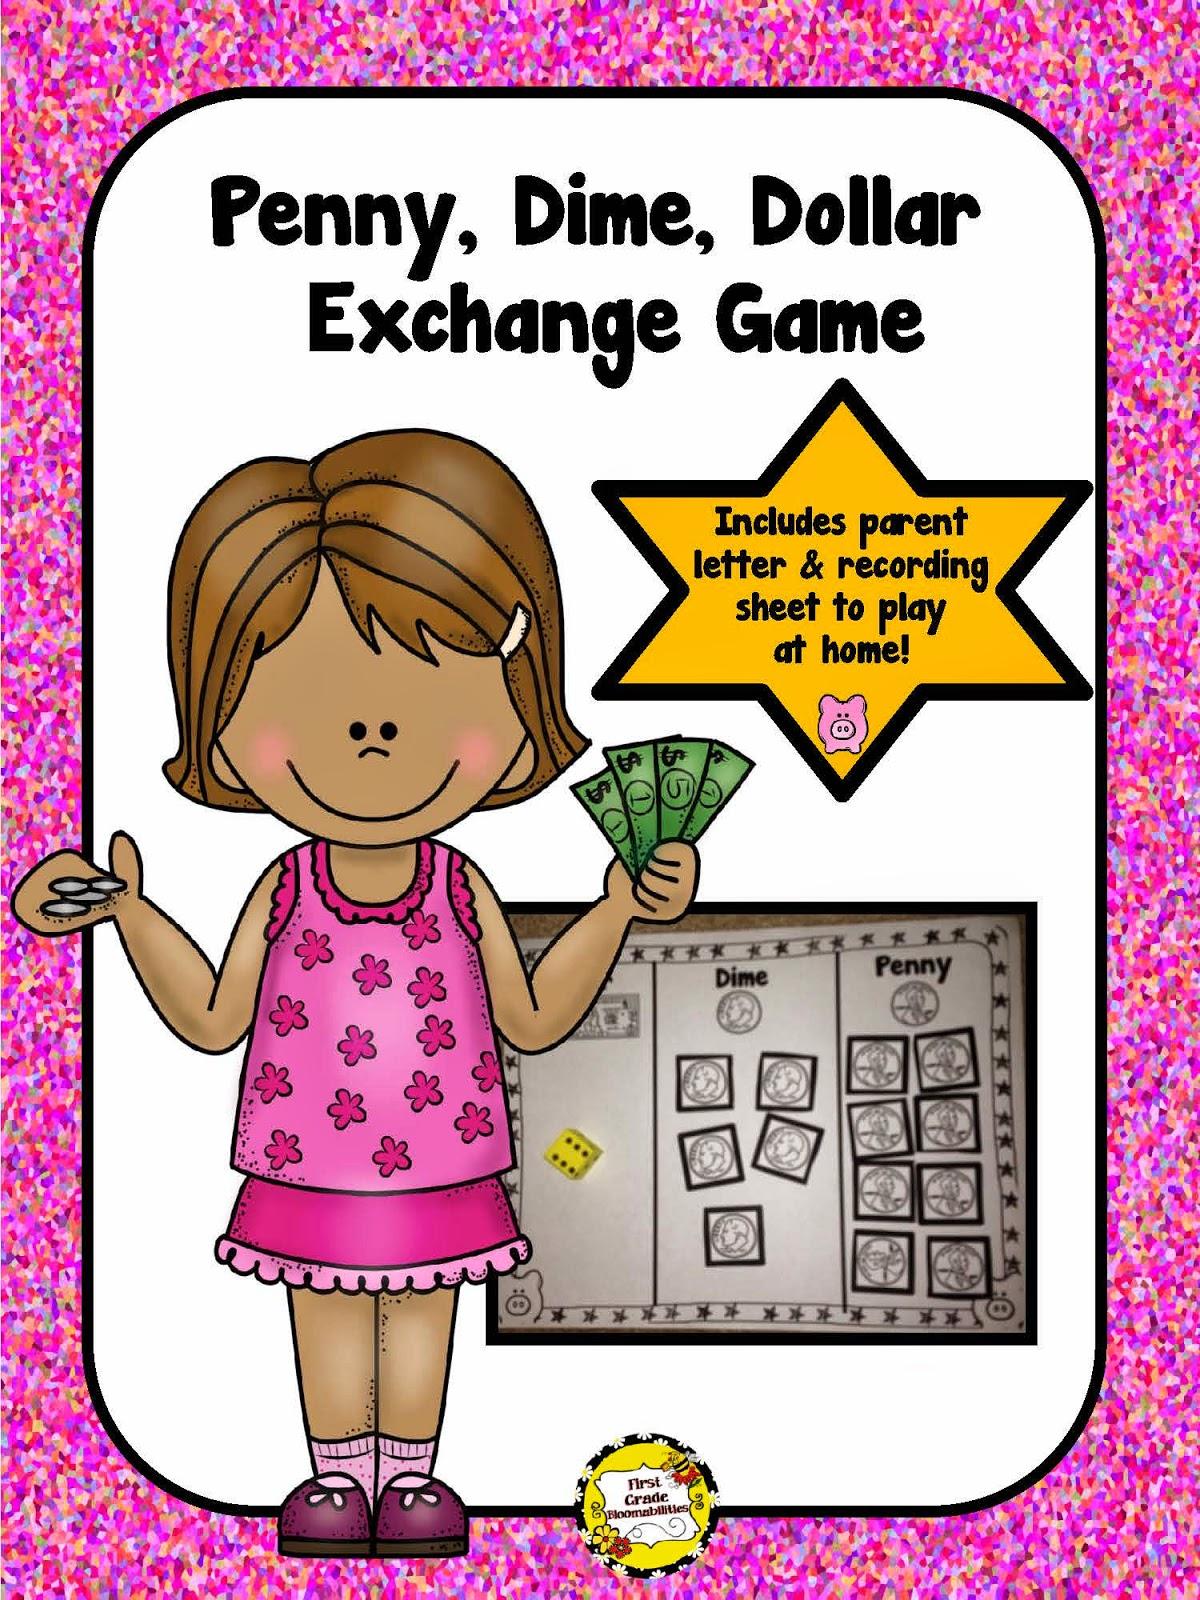 http://www.teacherspayteachers.com/Product/Penny-Dime-Dollar-Money-Exchange-Game-1647799